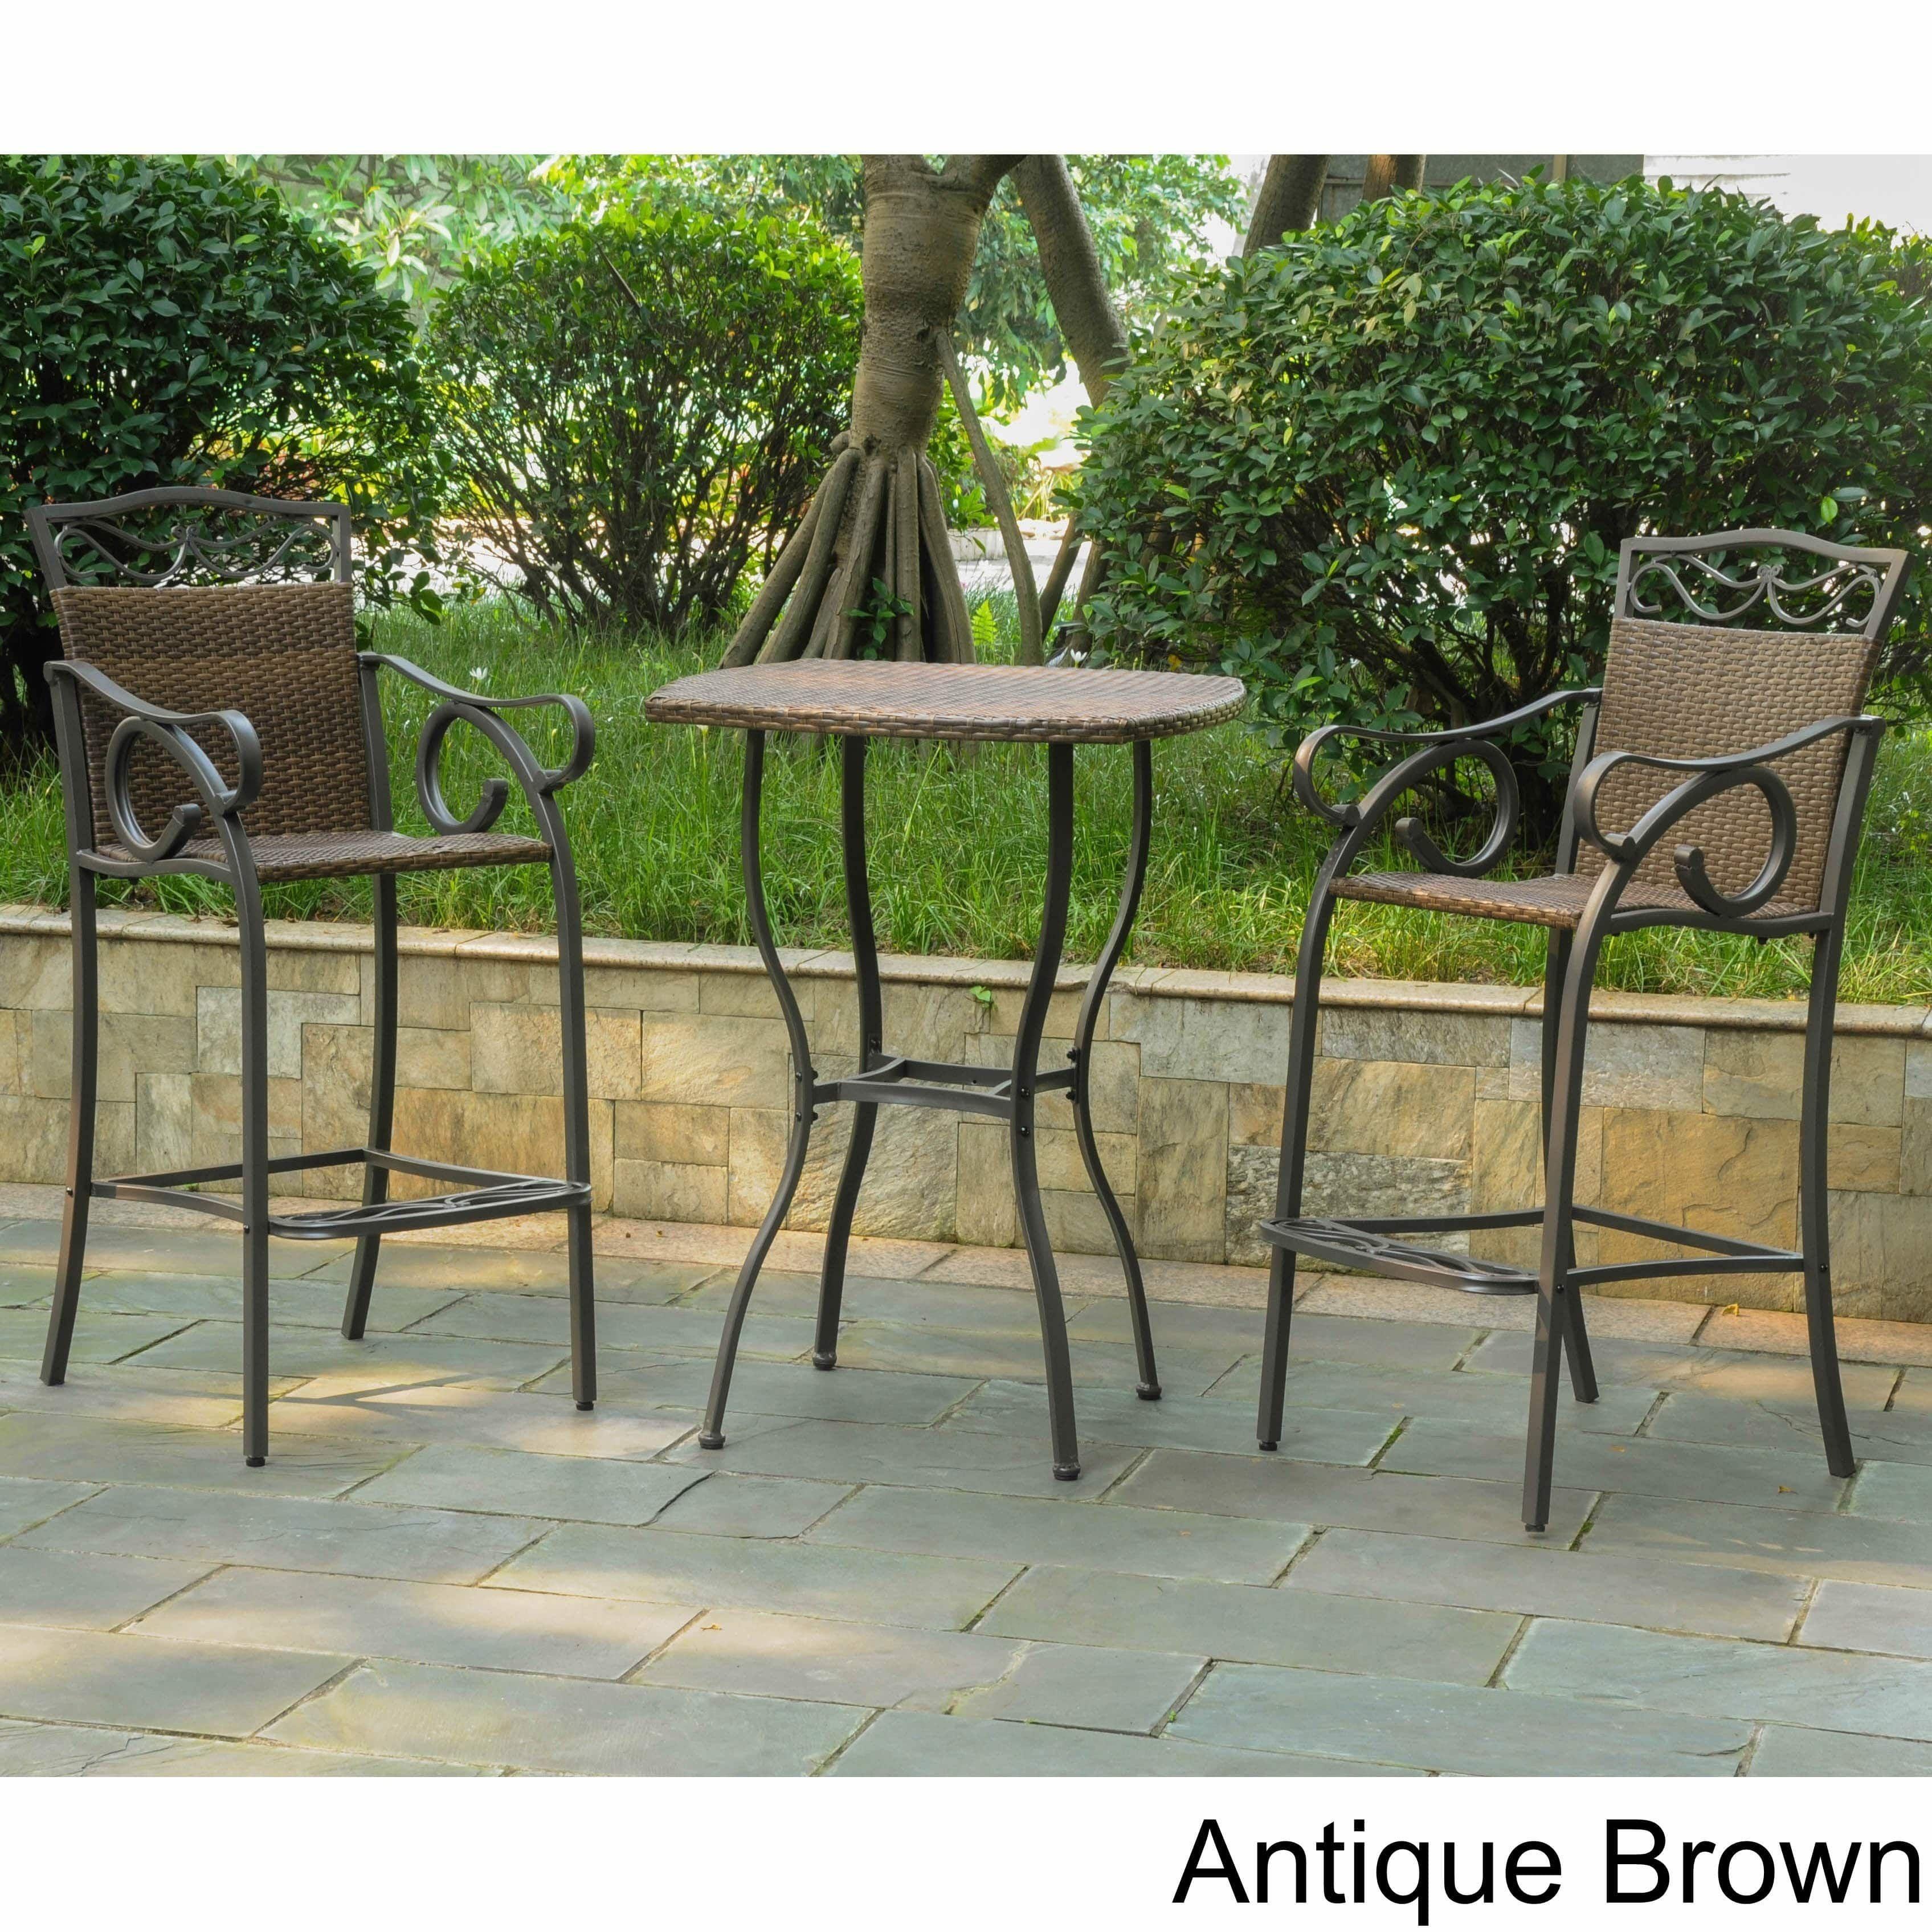 International Caravan Valencia Resin Wicker Steel 3 Piece Bar Height Bistro Set Brown Patio Furniture